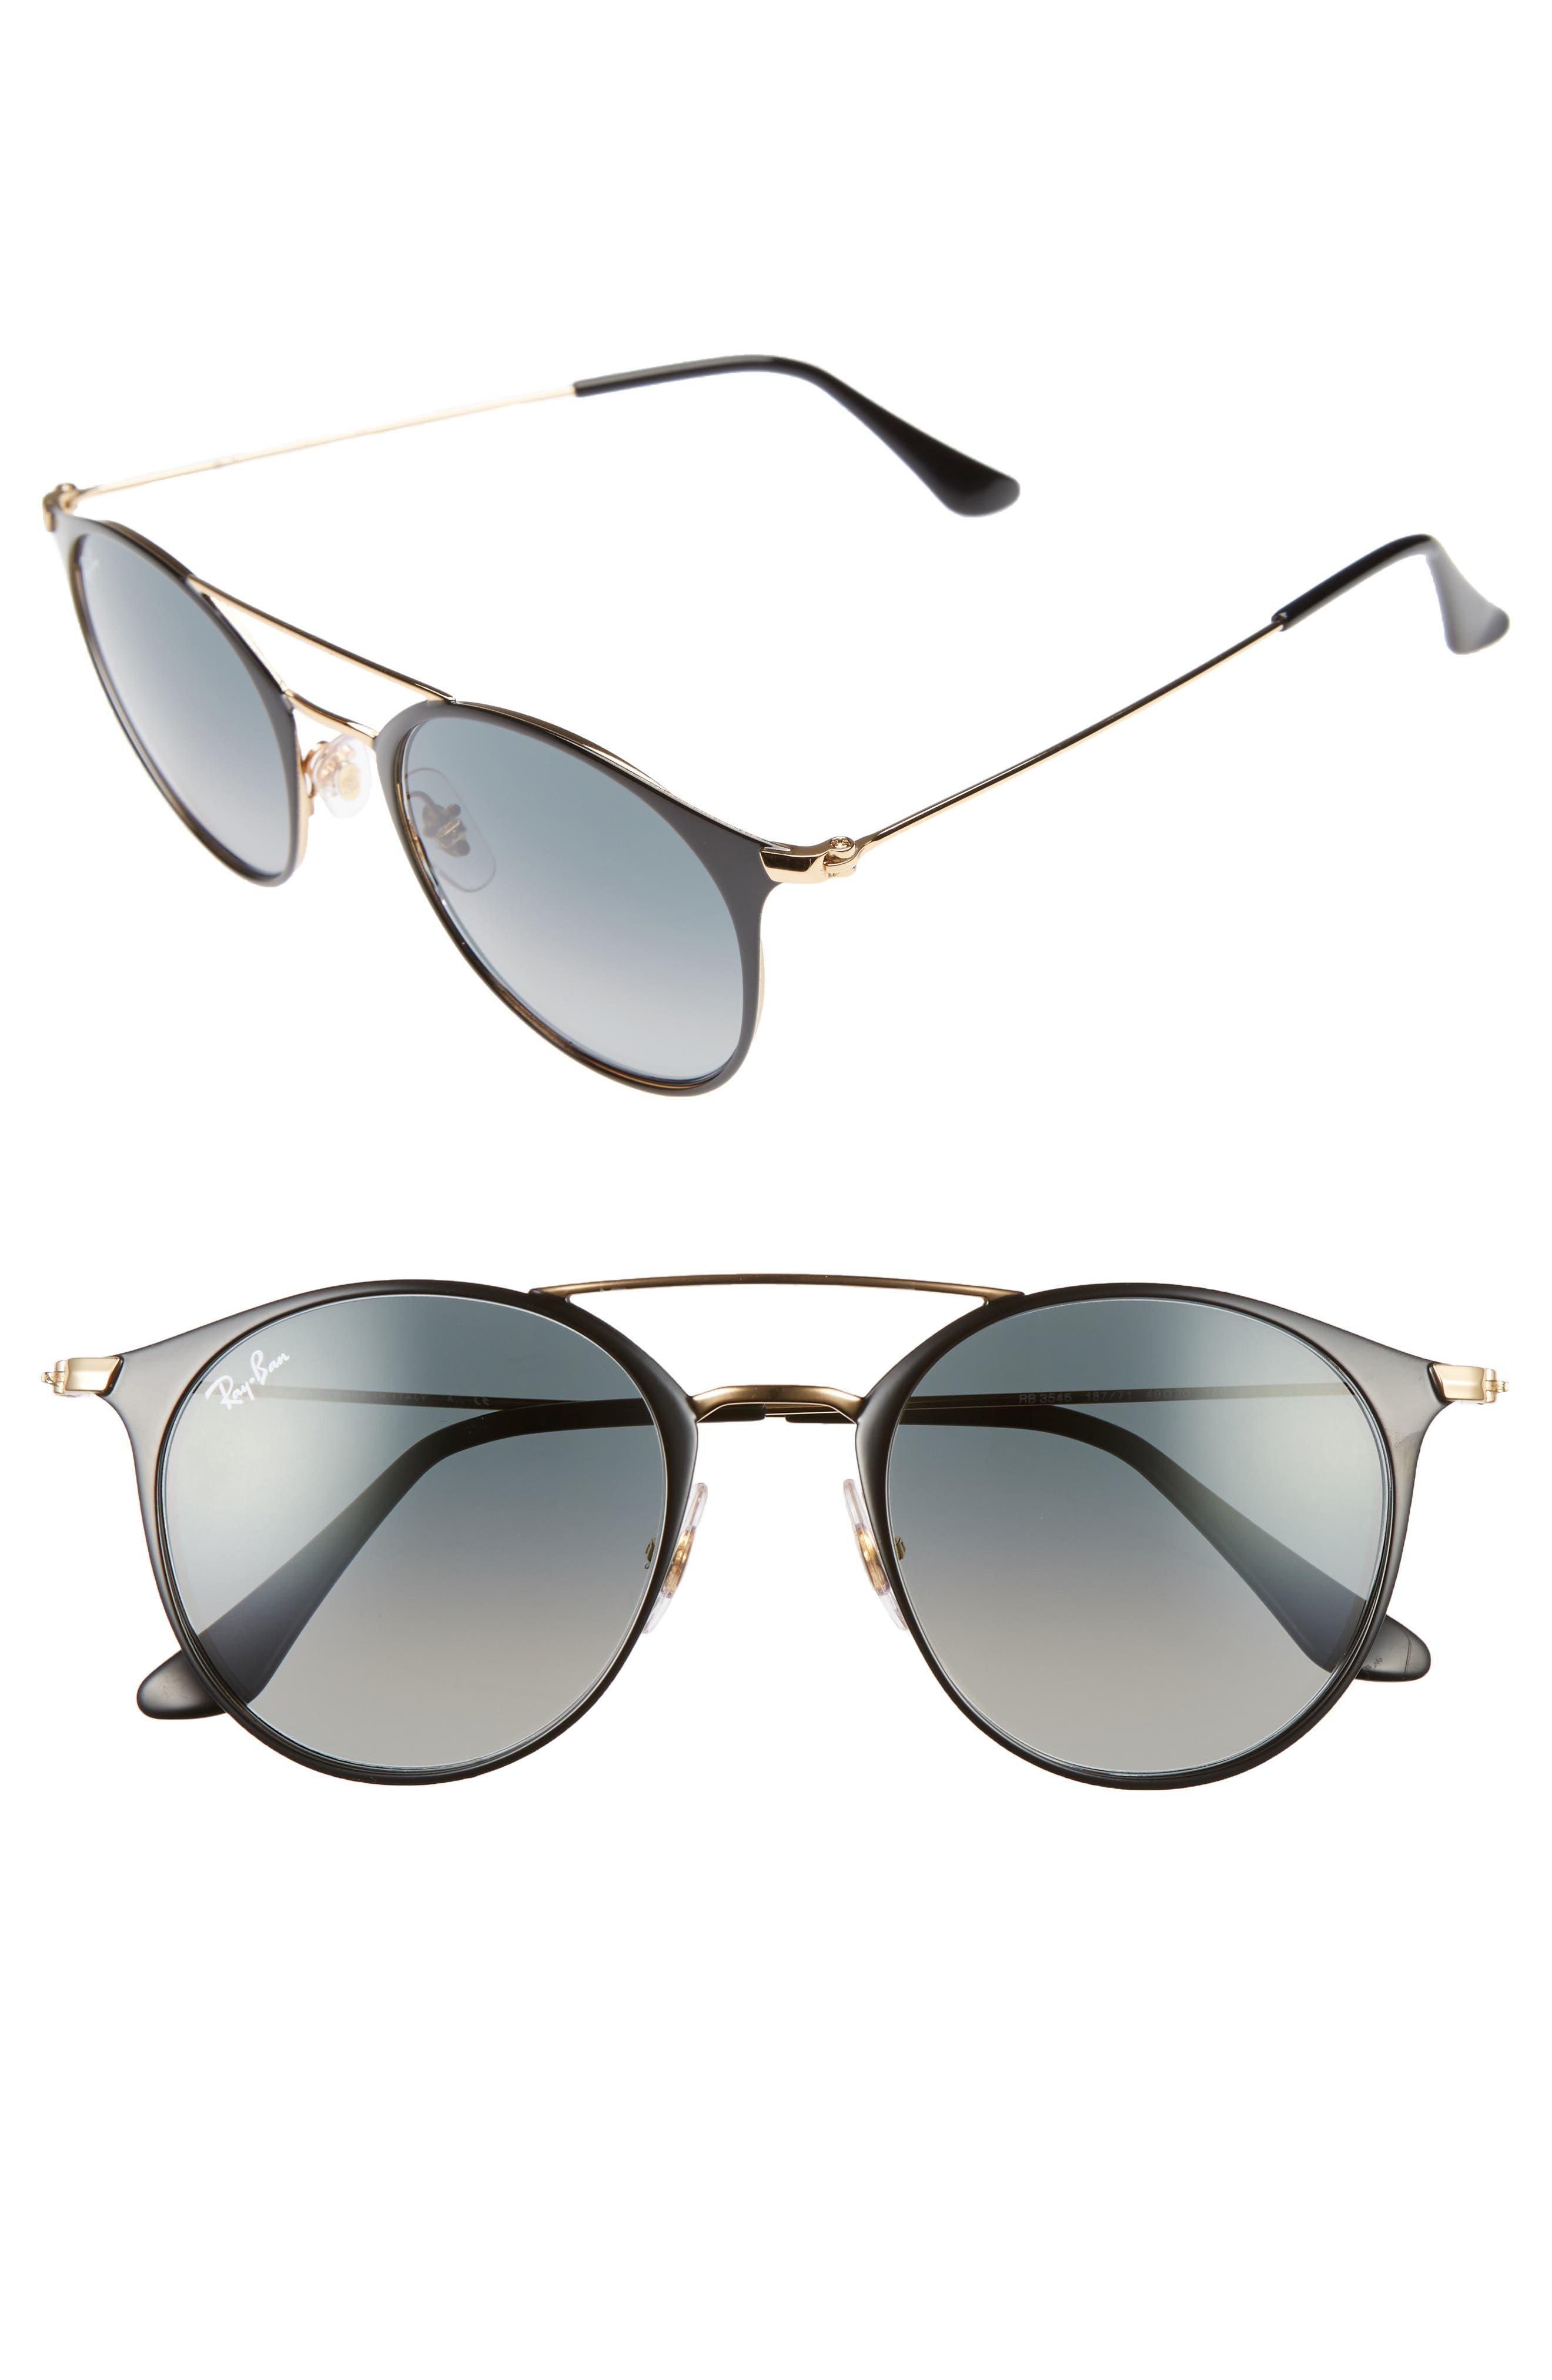 Ray-Ban 49mm Gradient Round Sunglasses